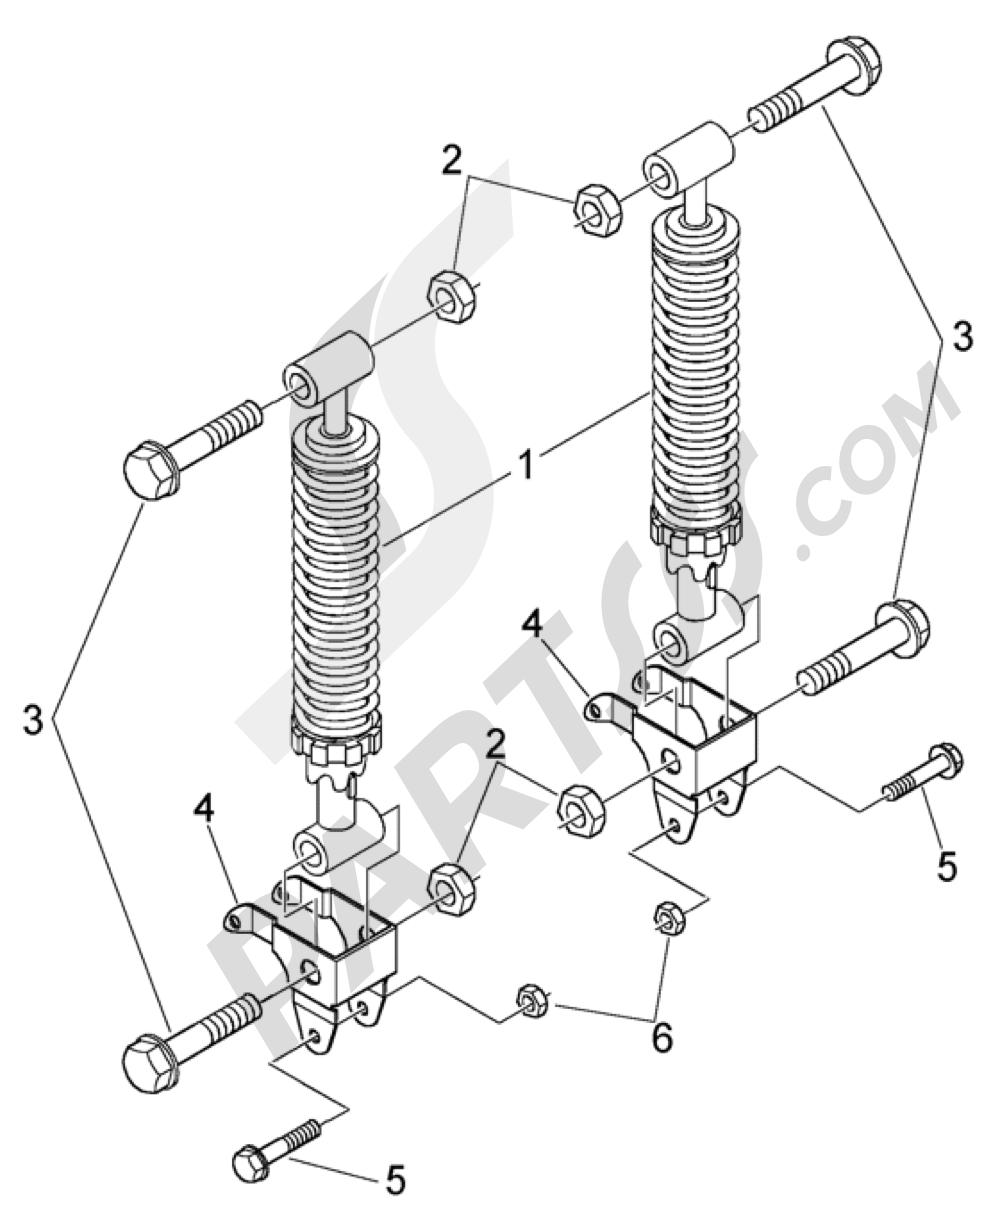 Piaggio BV 500 (U.S.A.) 1998-2005 Amortiguadores